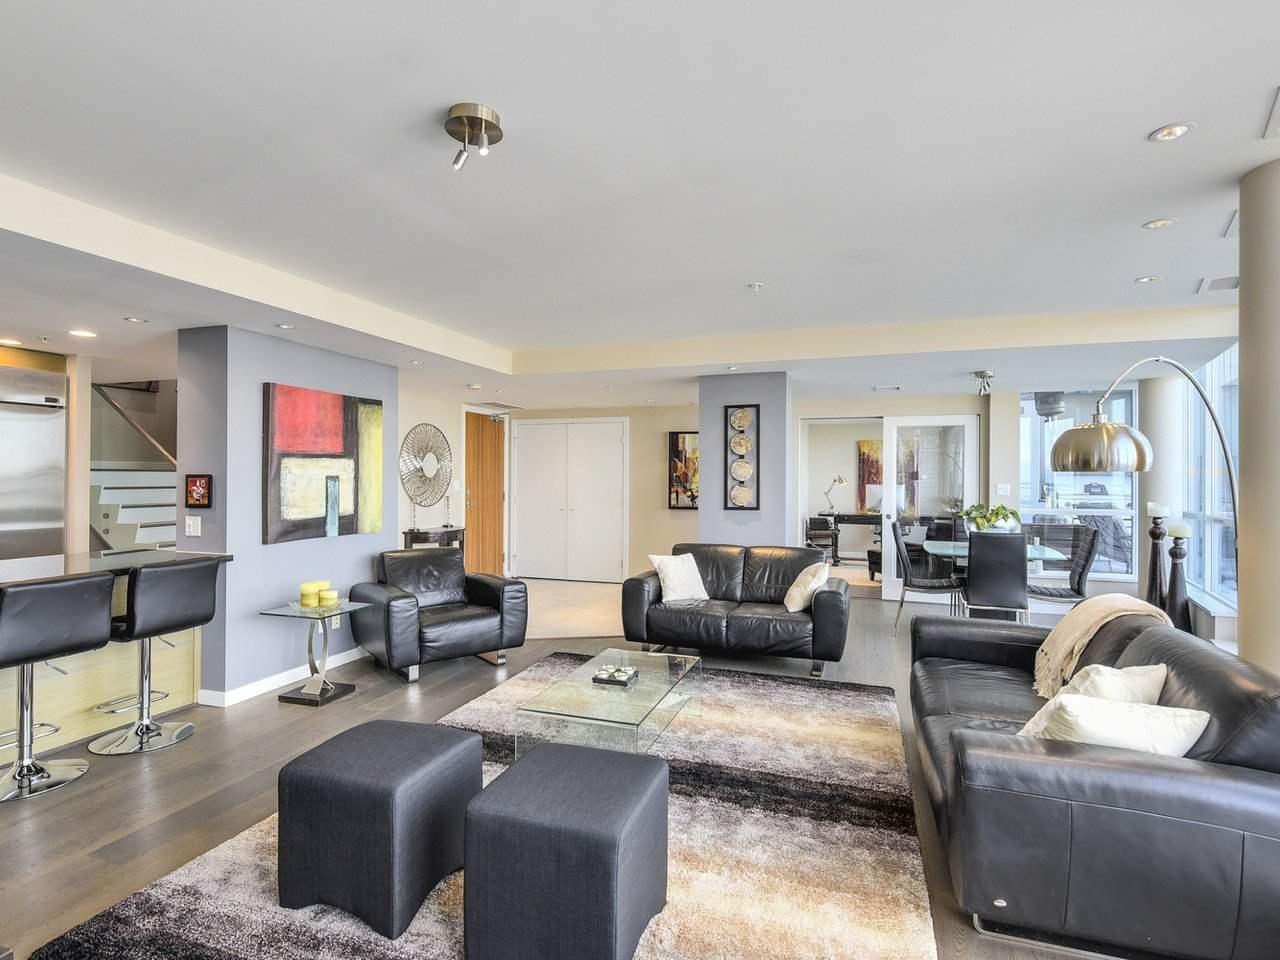 Condo Apartment at PH3 833 SEYMOUR STREET, Unit PH3, Vancouver West, British Columbia. Image 5